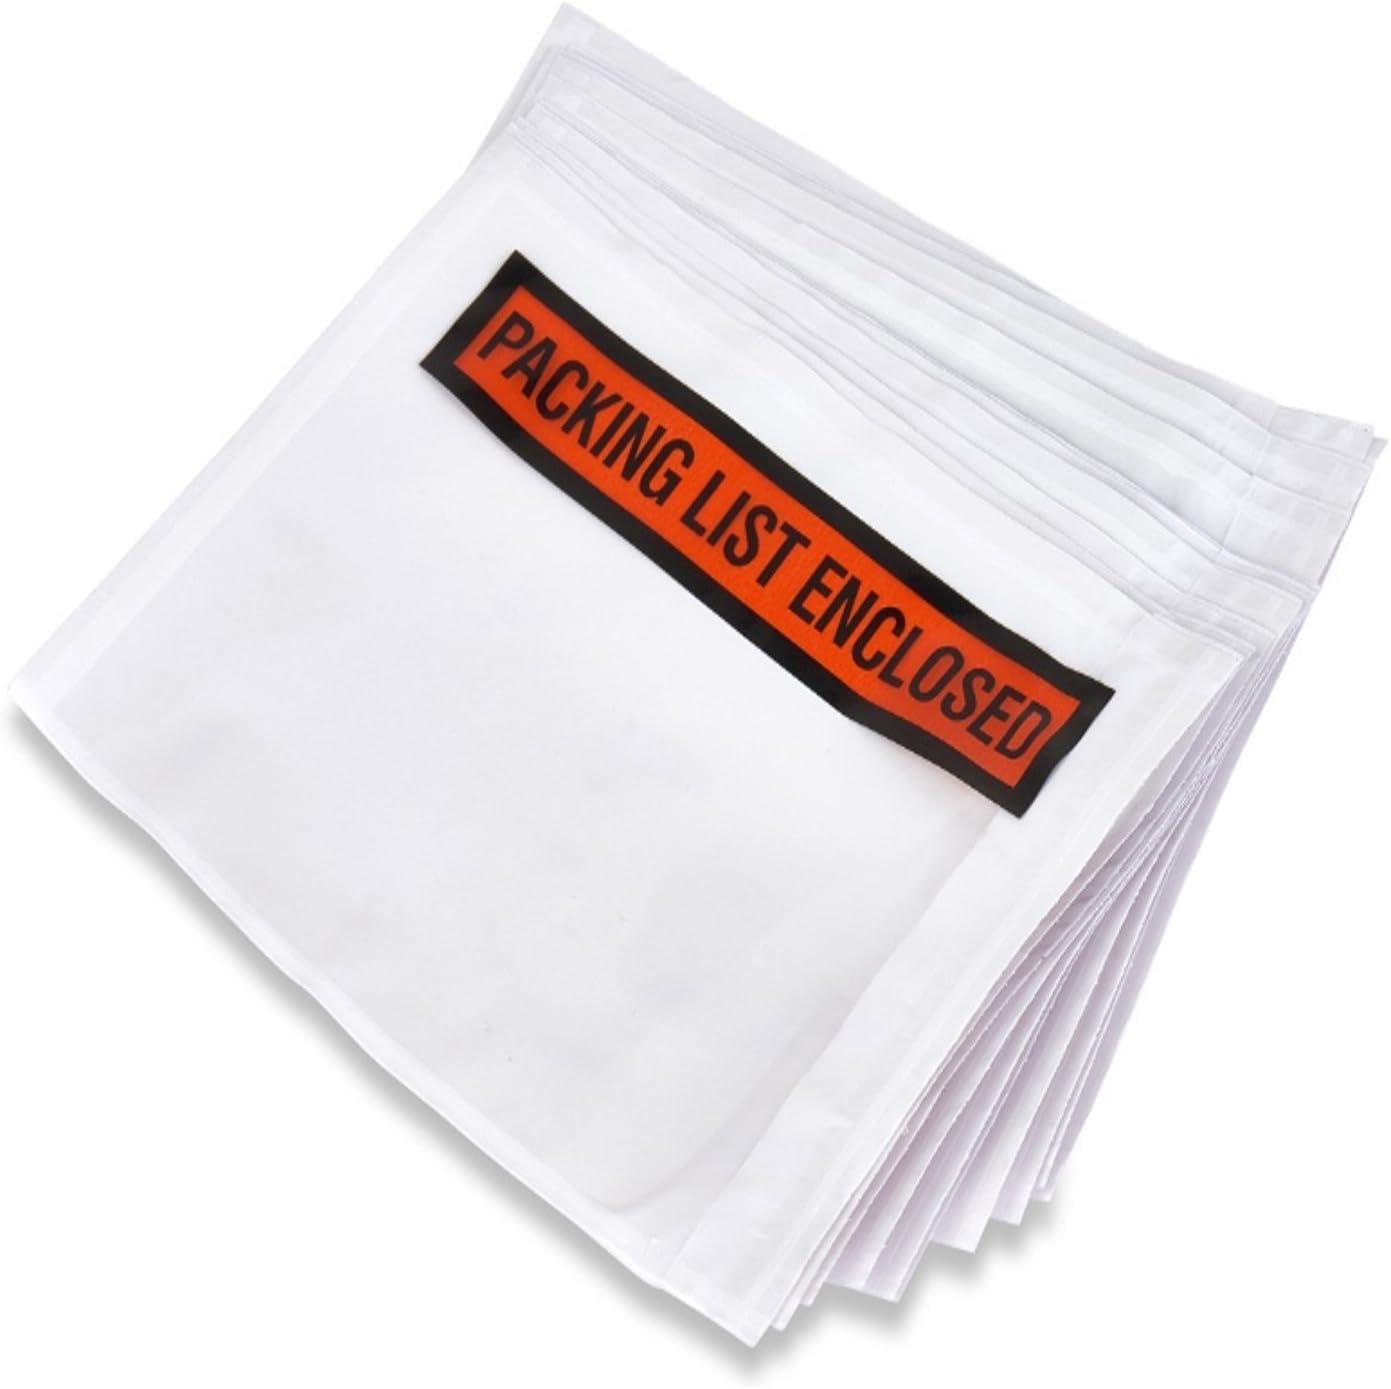 BOXN1 100 pcs 4.5 x 5.5 Packing List Enclosed Back Side Loading Envelopes Pouches 100 pcs